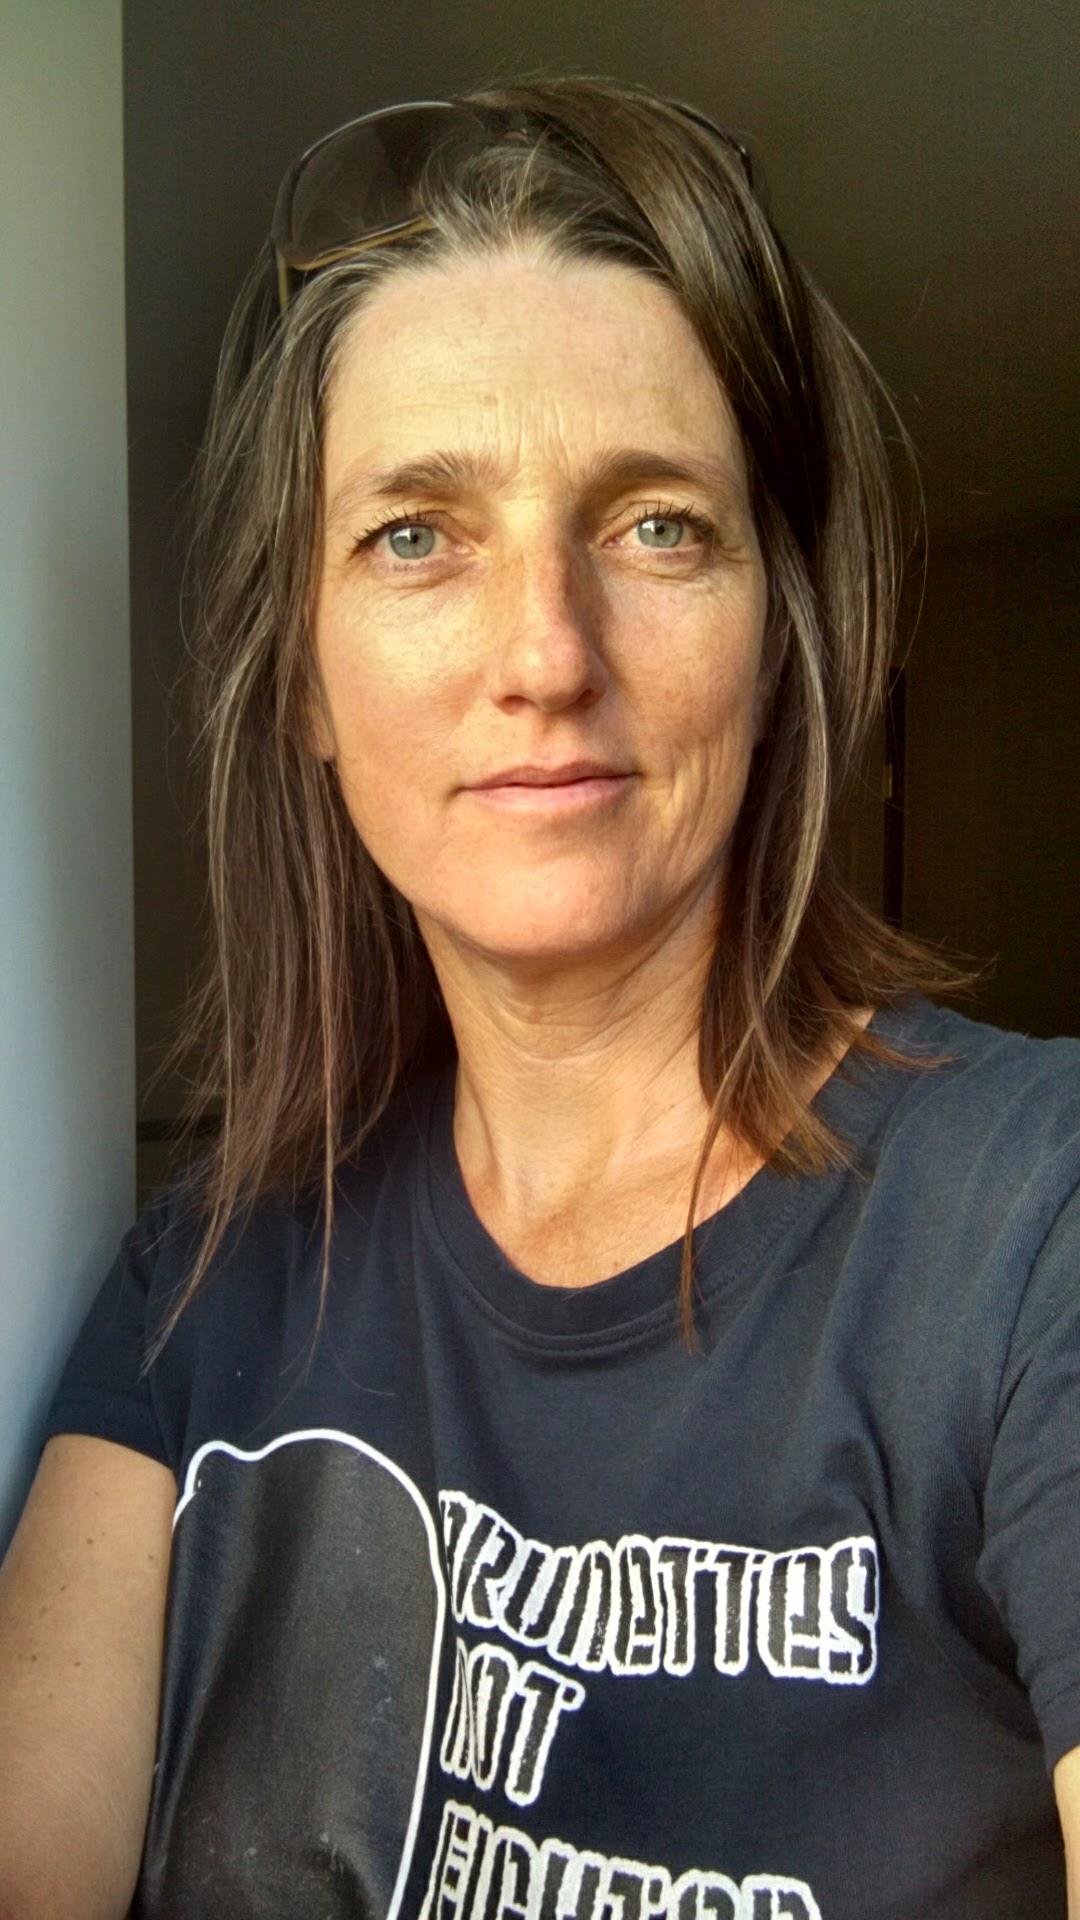 Word of Mouth: San Francisco Conversations—Nene Burns, Executive Coach